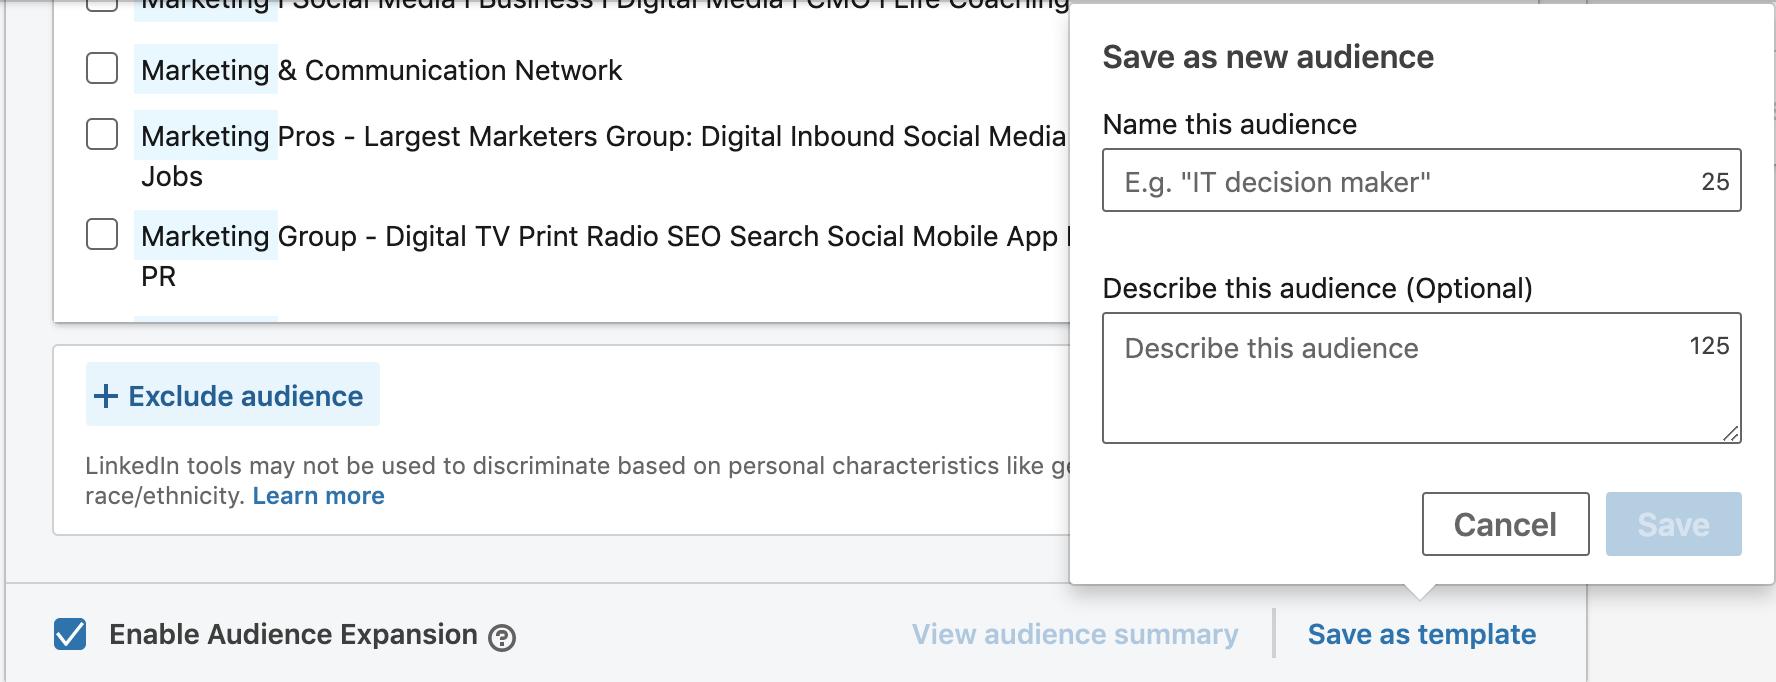 linkedin ads save as template